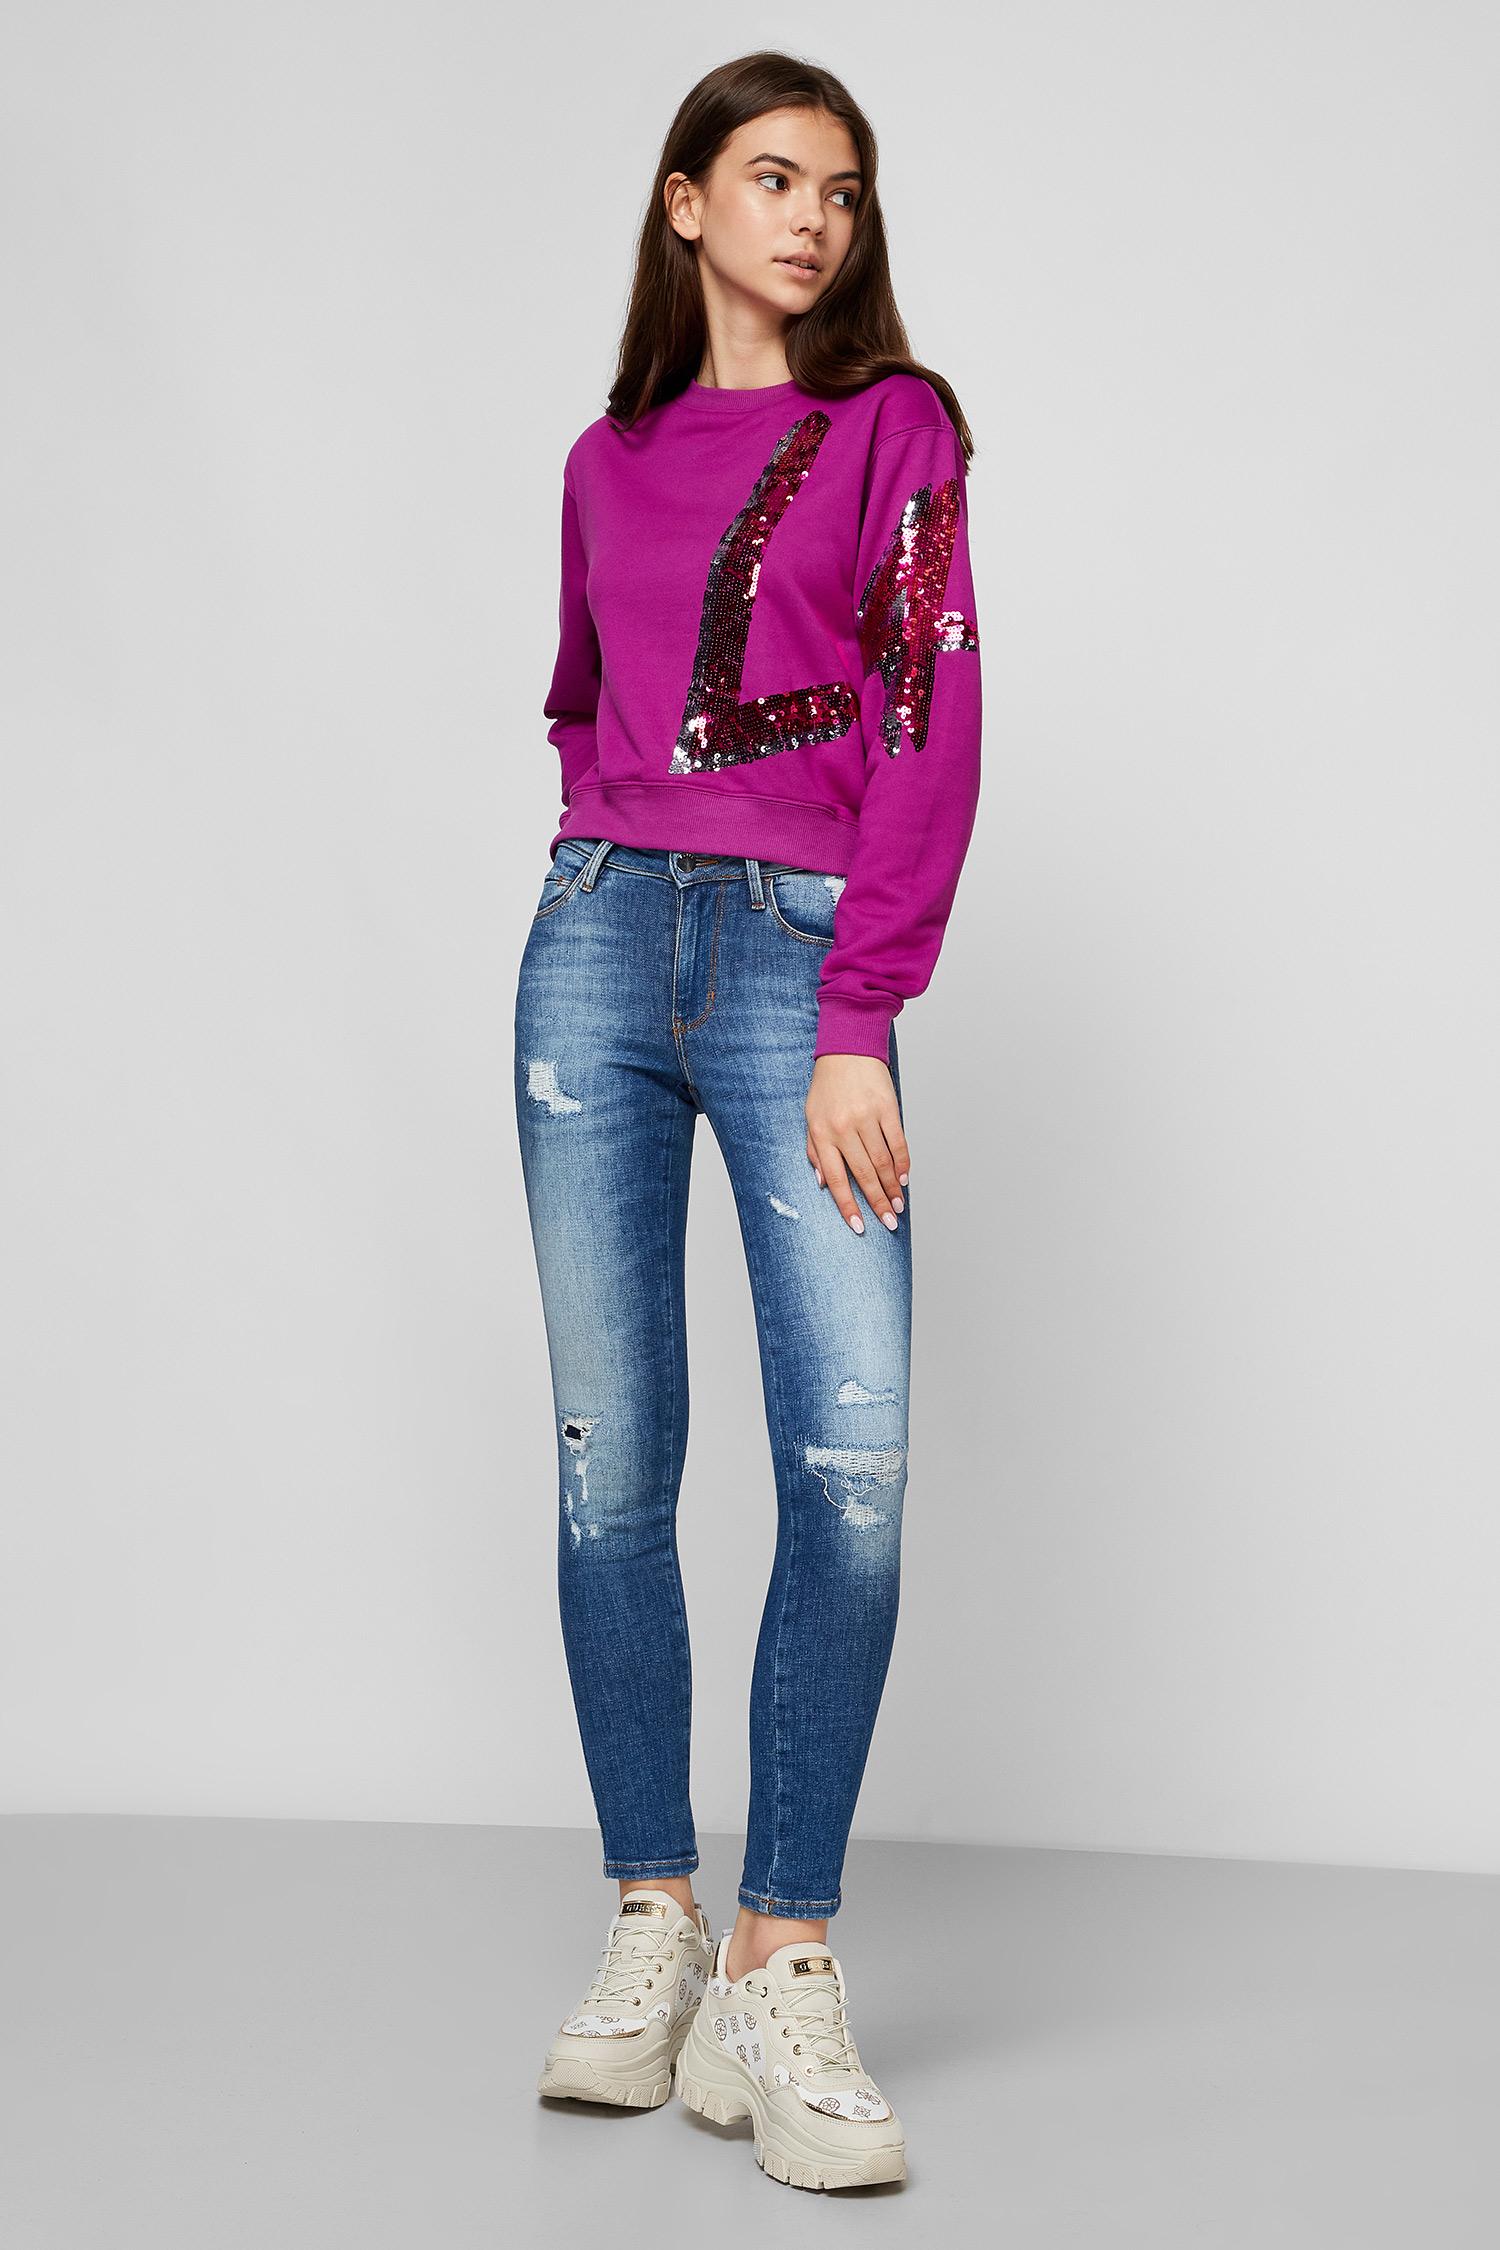 Фиолетовый свитшот для девушек Guess W0YQ77.K8800;G406